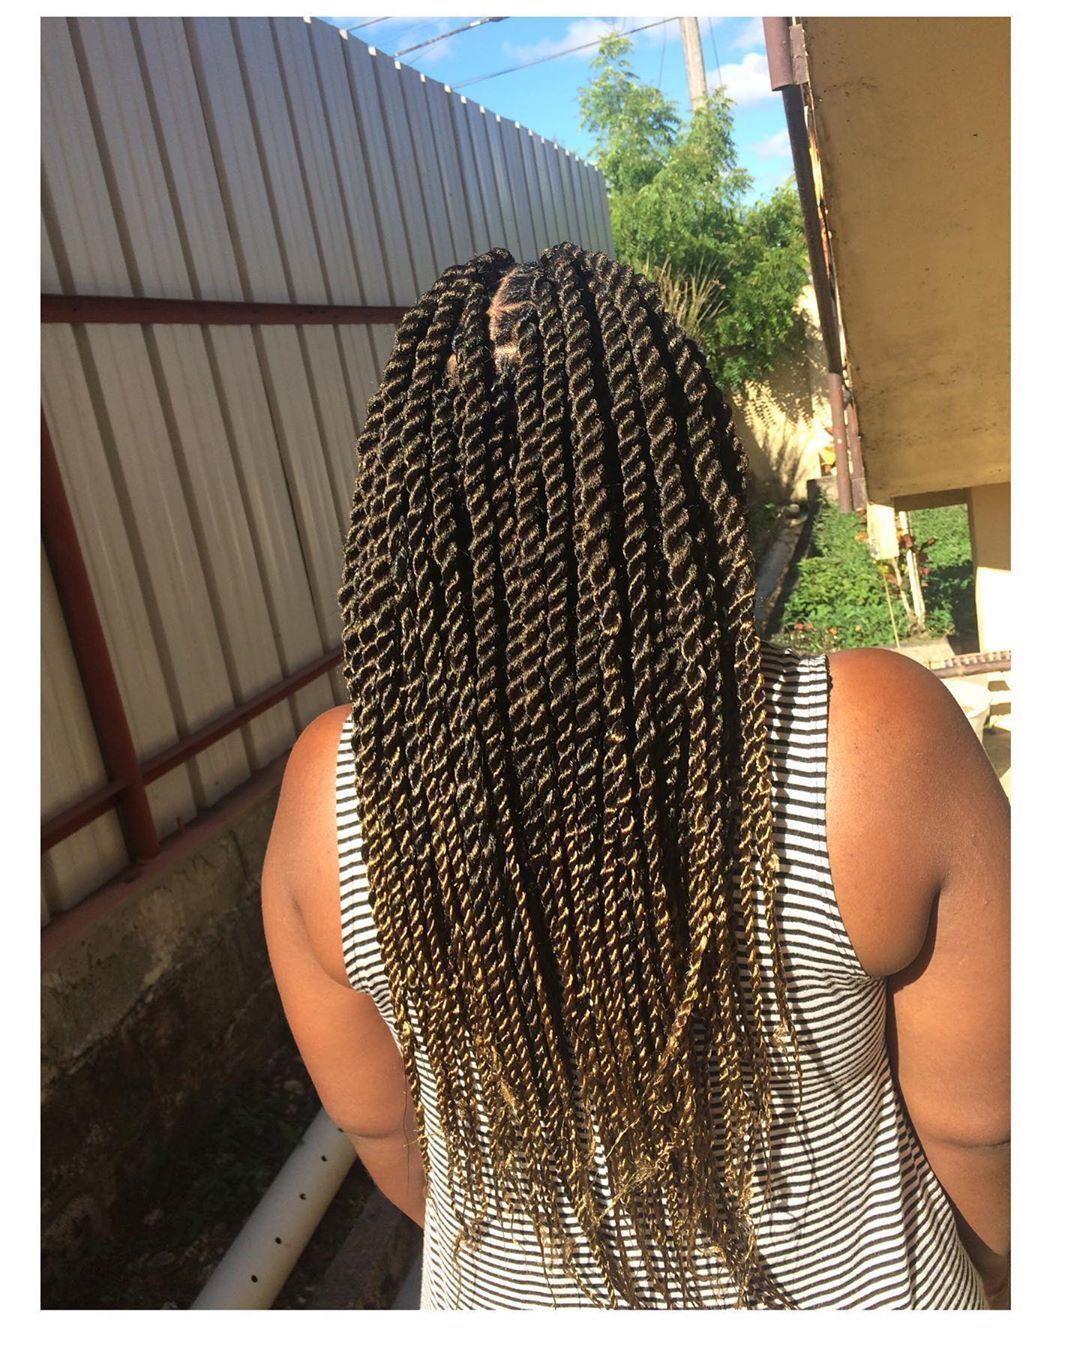 ✨Senegalese twist   4 packs of super TZ braiding hair   Get slayed, Get braided! . . . . . #trinidadbraider #picoftheday #trinidad #trinidadandtobago🇹🇹 #braidstyles #boxbraidstyle #braids #neatbraids #boxbraids #beauty #protectivestyles #braidstylist #hairstylist #braidseason #hairstyles #boxbraidstyles #kidsbraids #naturalhair #hair #boxbraids  #braidpreneur